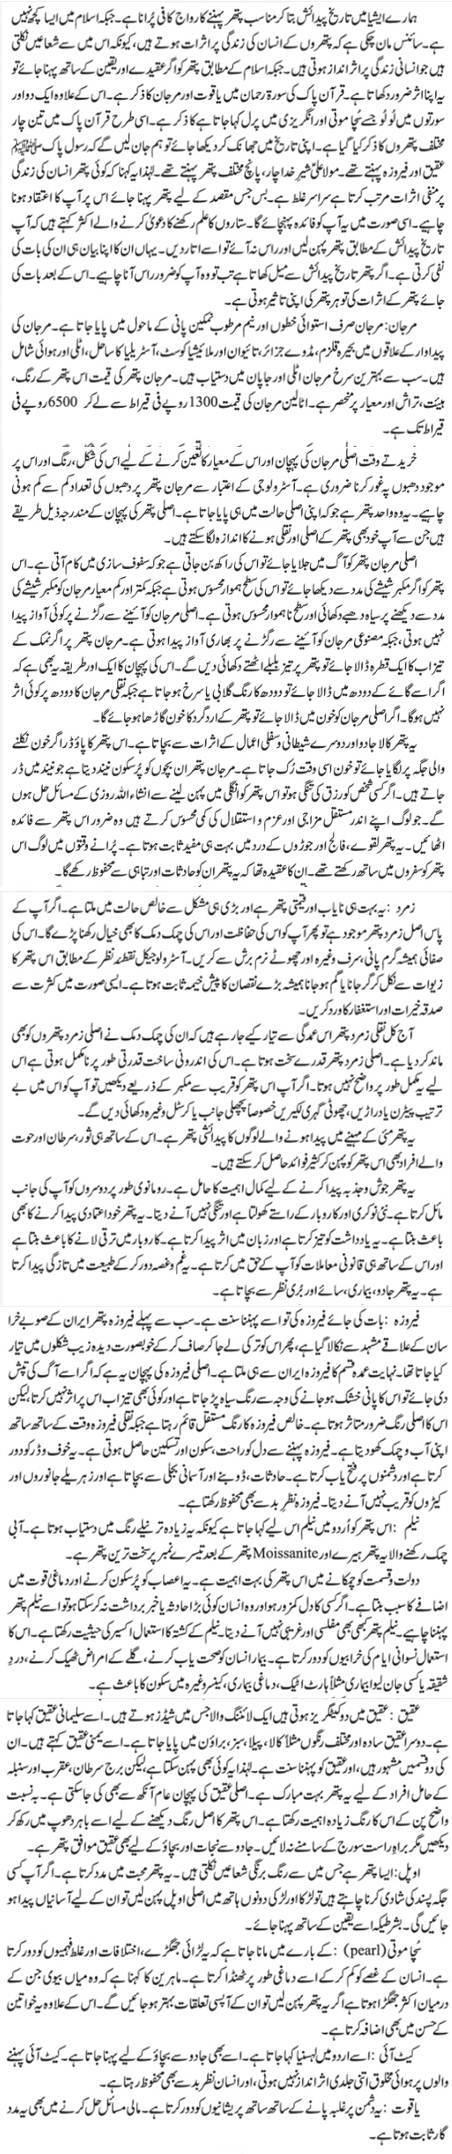 Effects & Health Benefits of Gemstones (Urdu & English Guide)